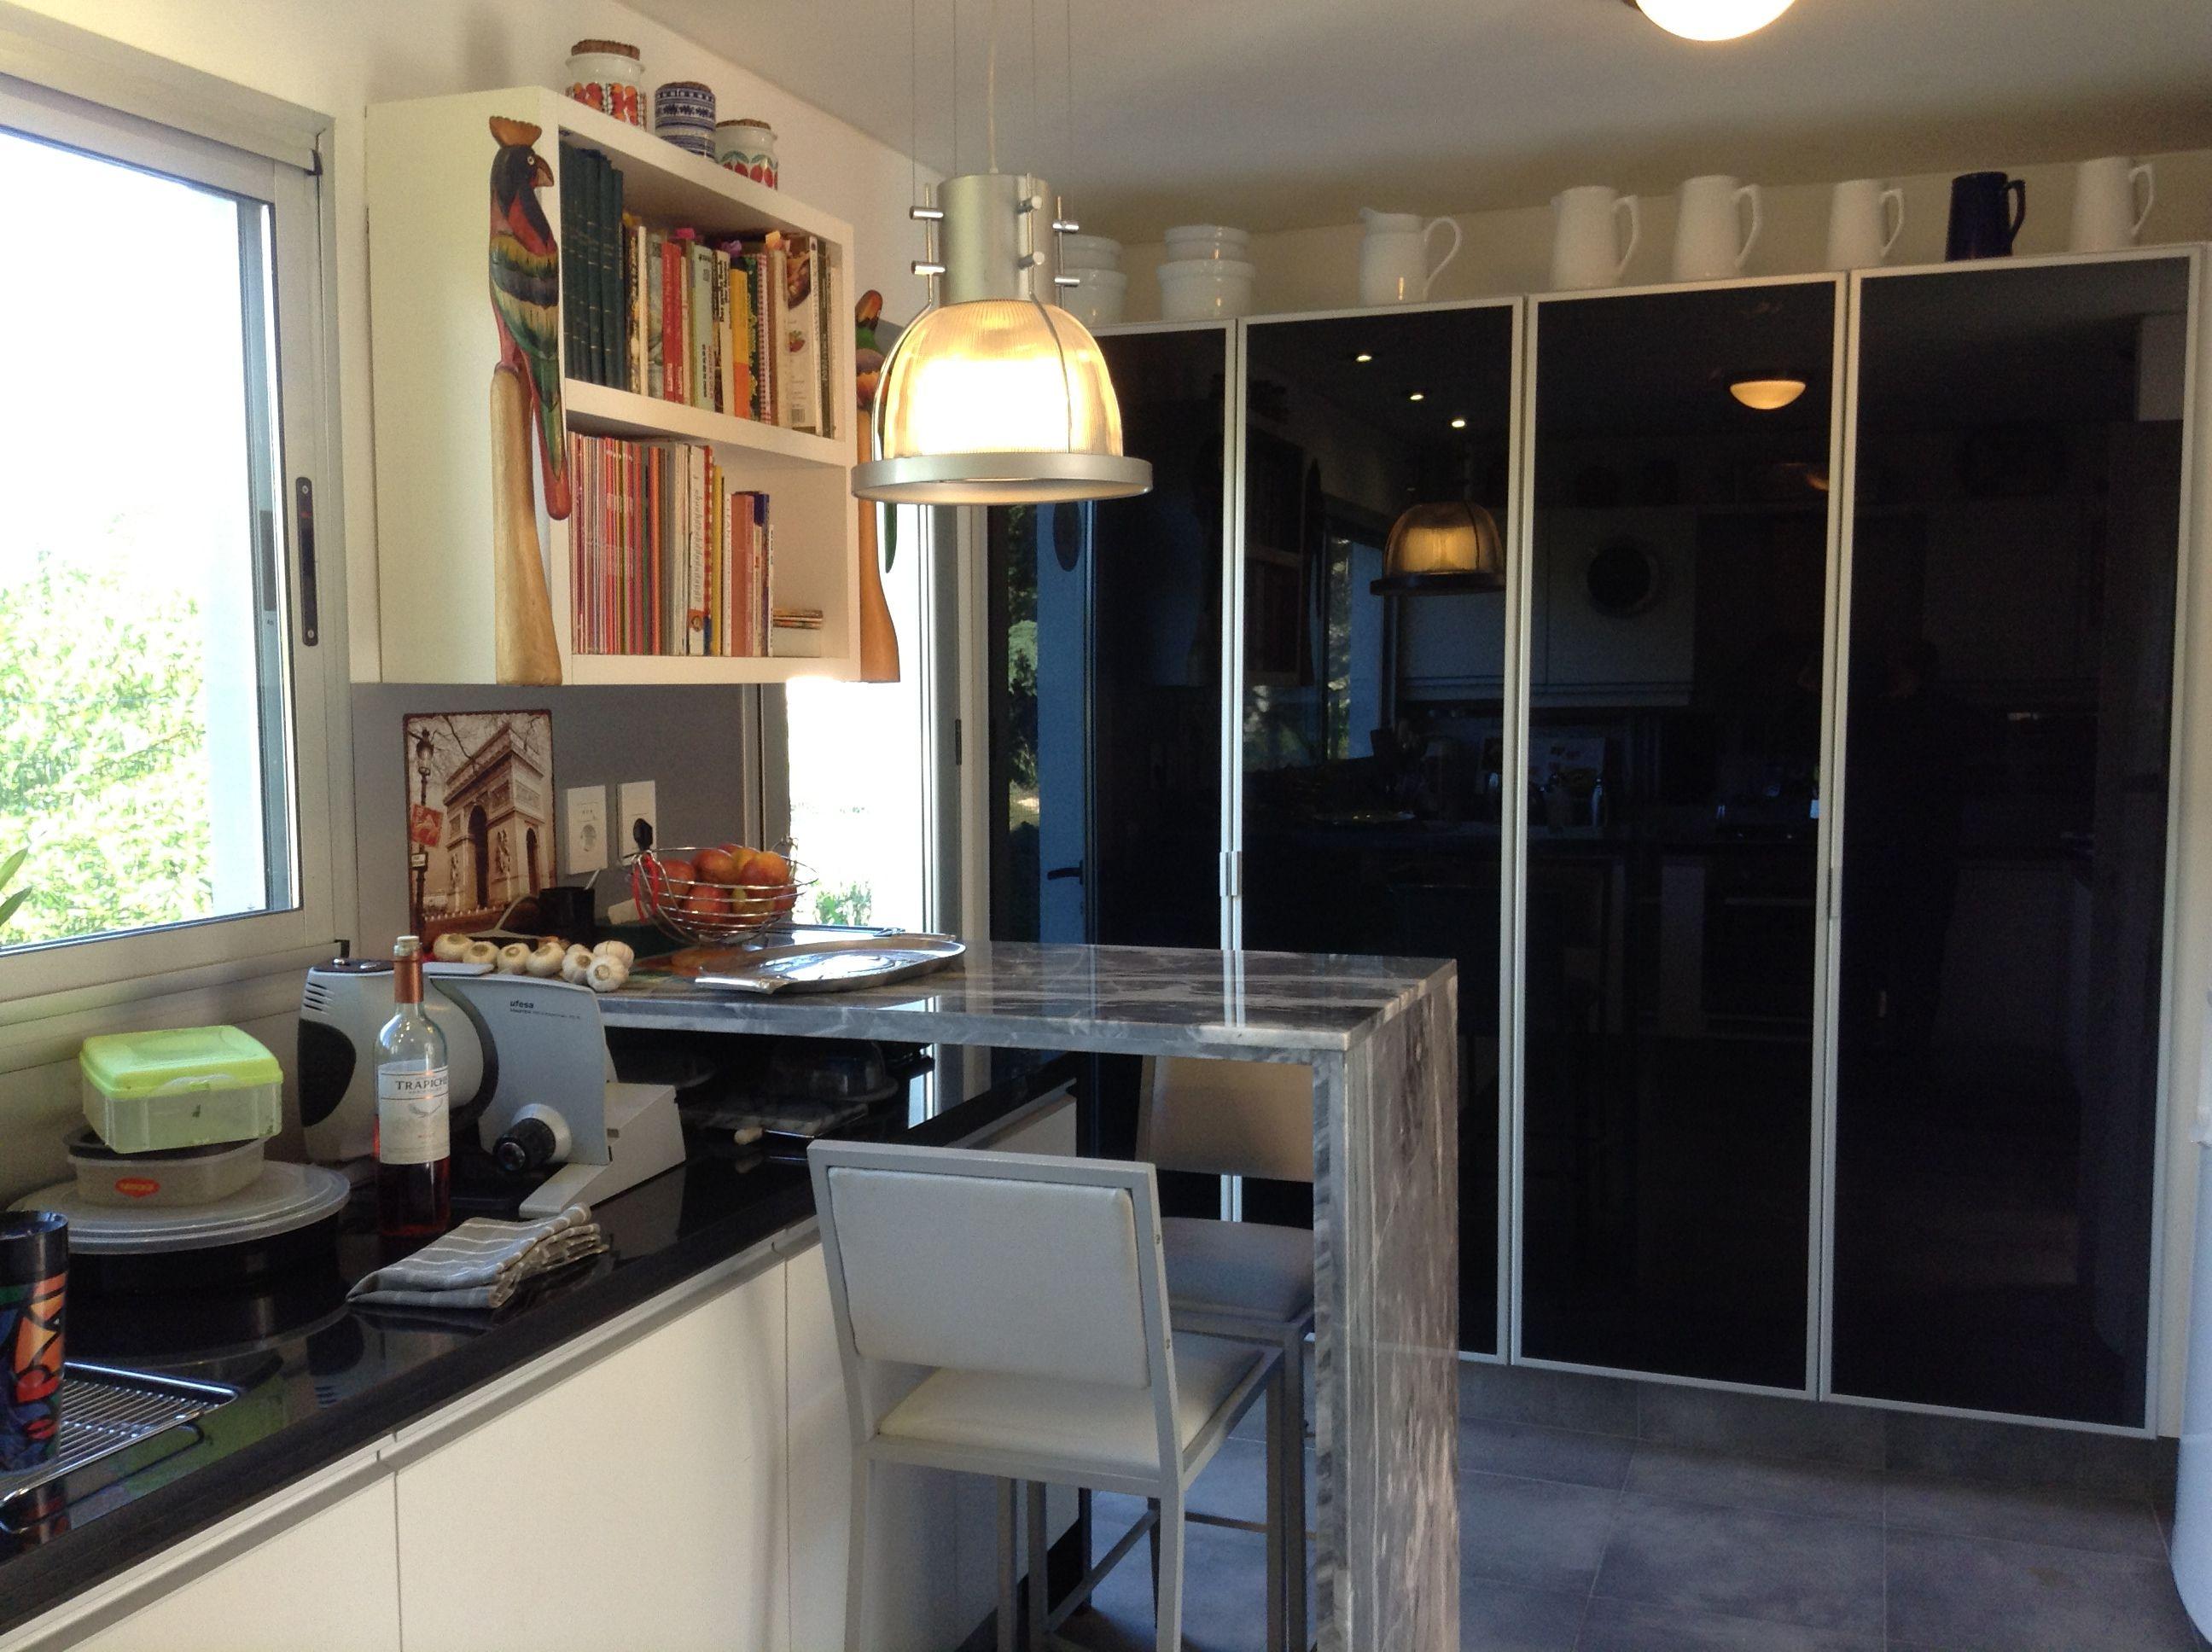 Despensas con puertas de aluminio y vidrio negro for Despensas de cocina